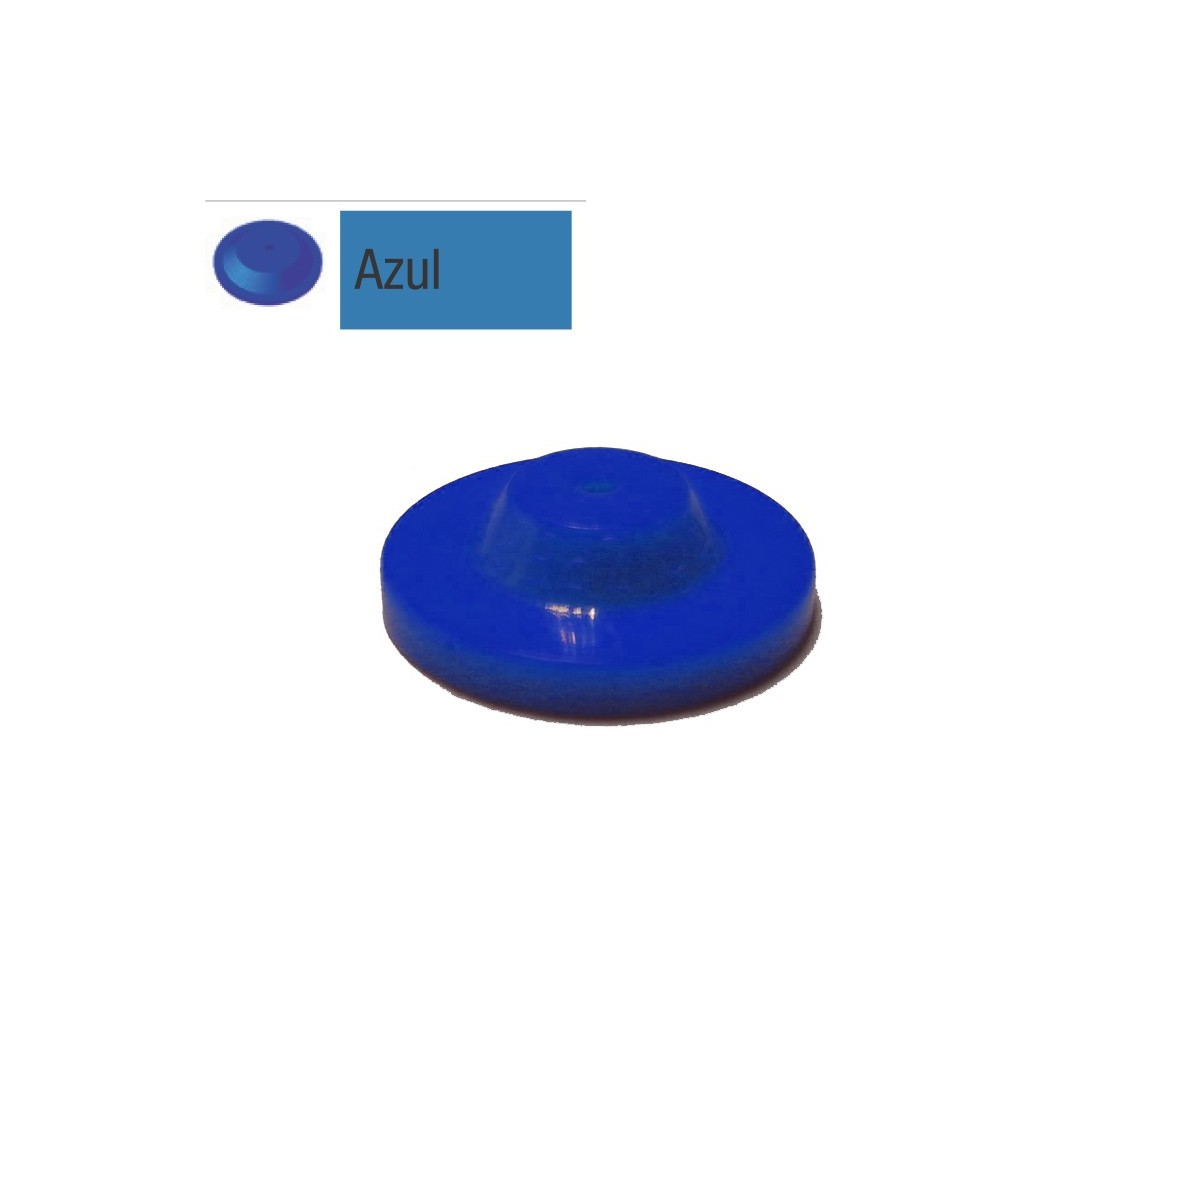 Matabi boquilla de disco azul hc 80/1.2/3